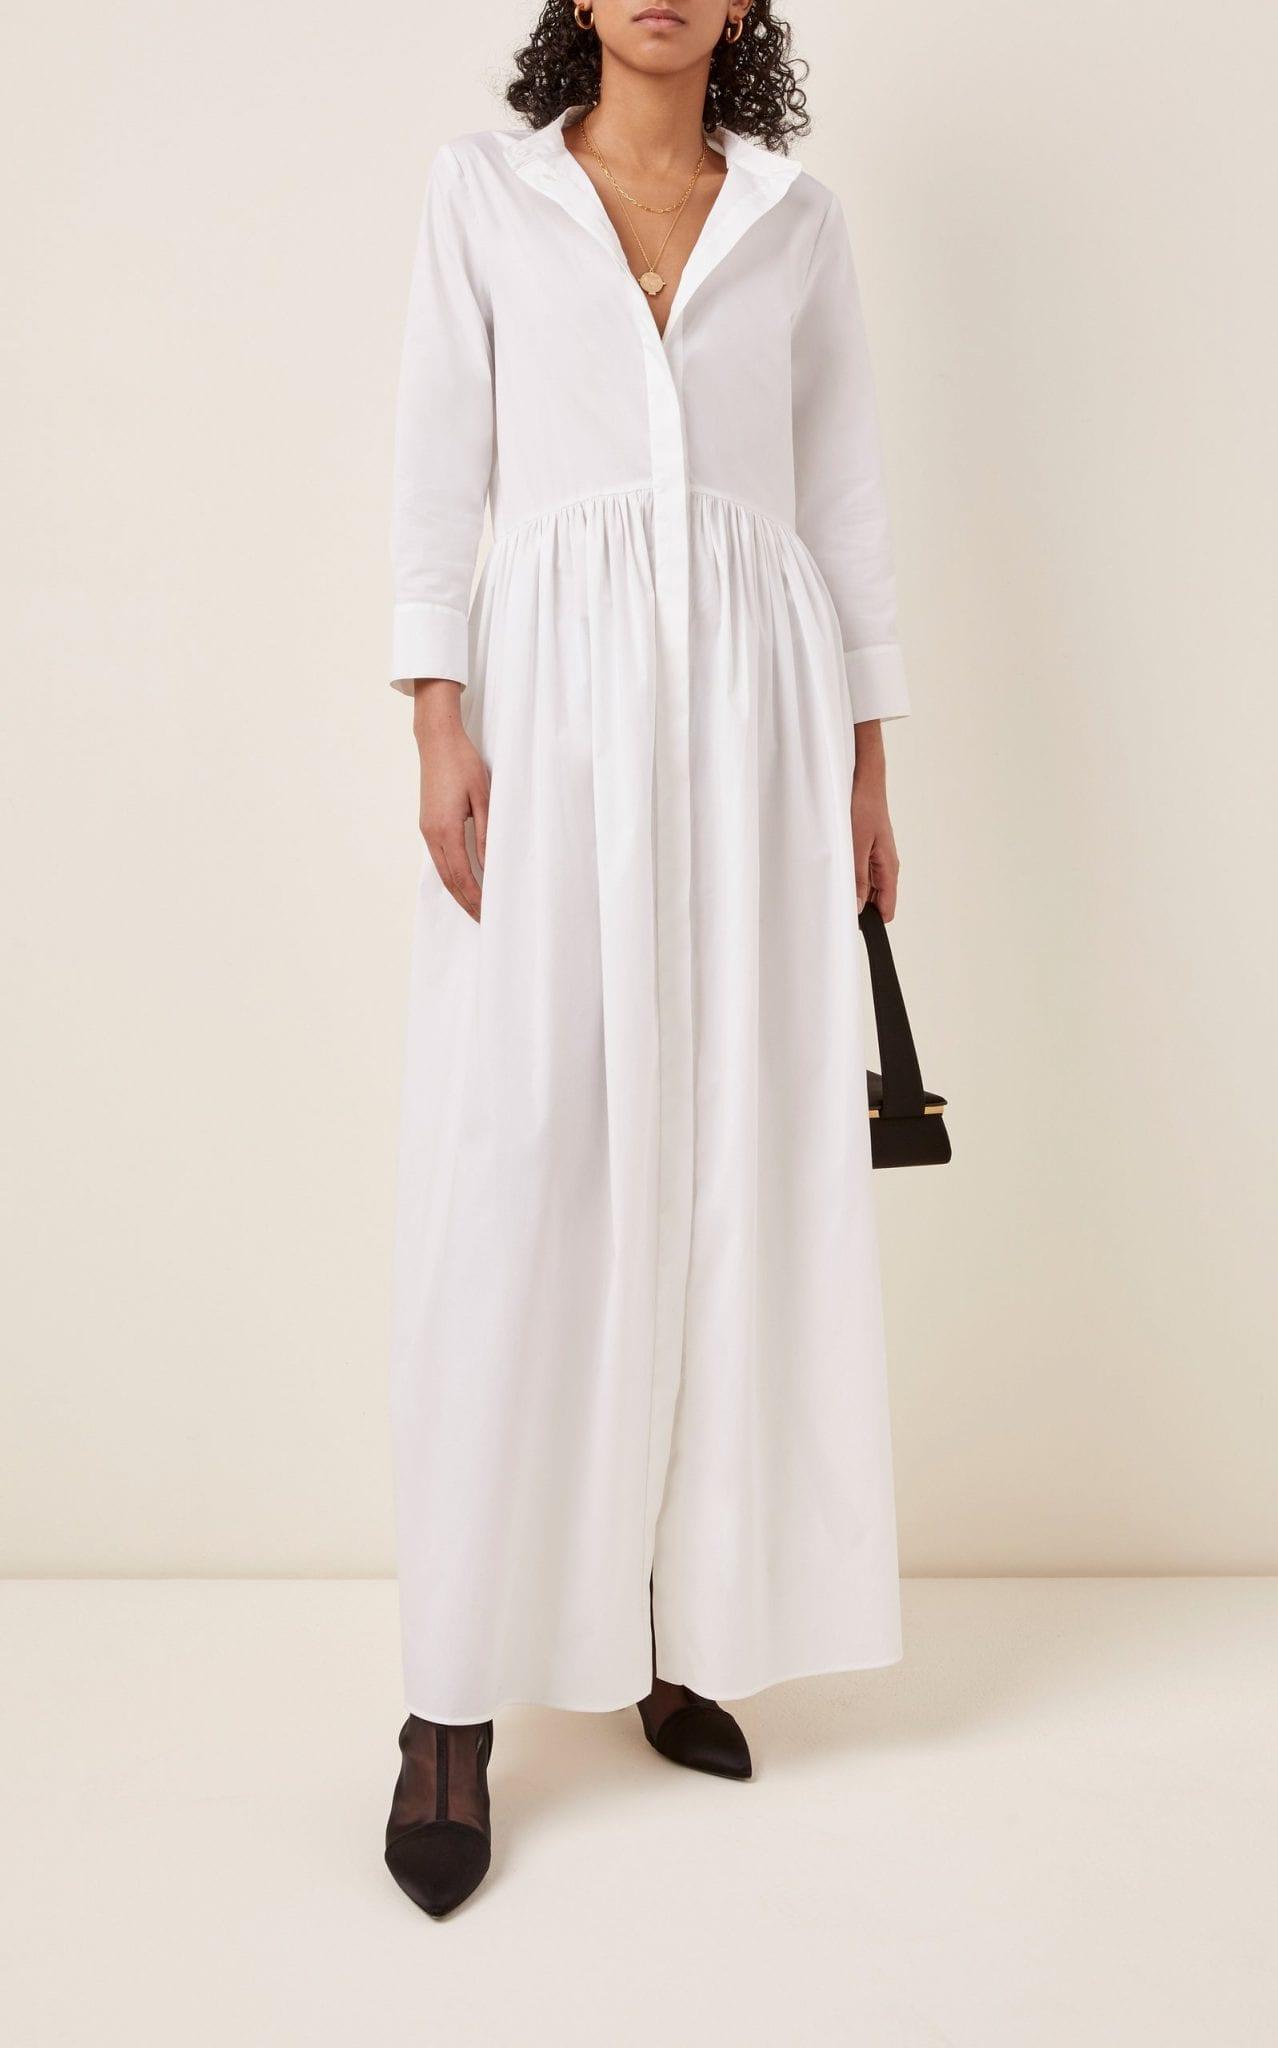 BROCK COLLECTION Cotton-Blend Maxi Dress